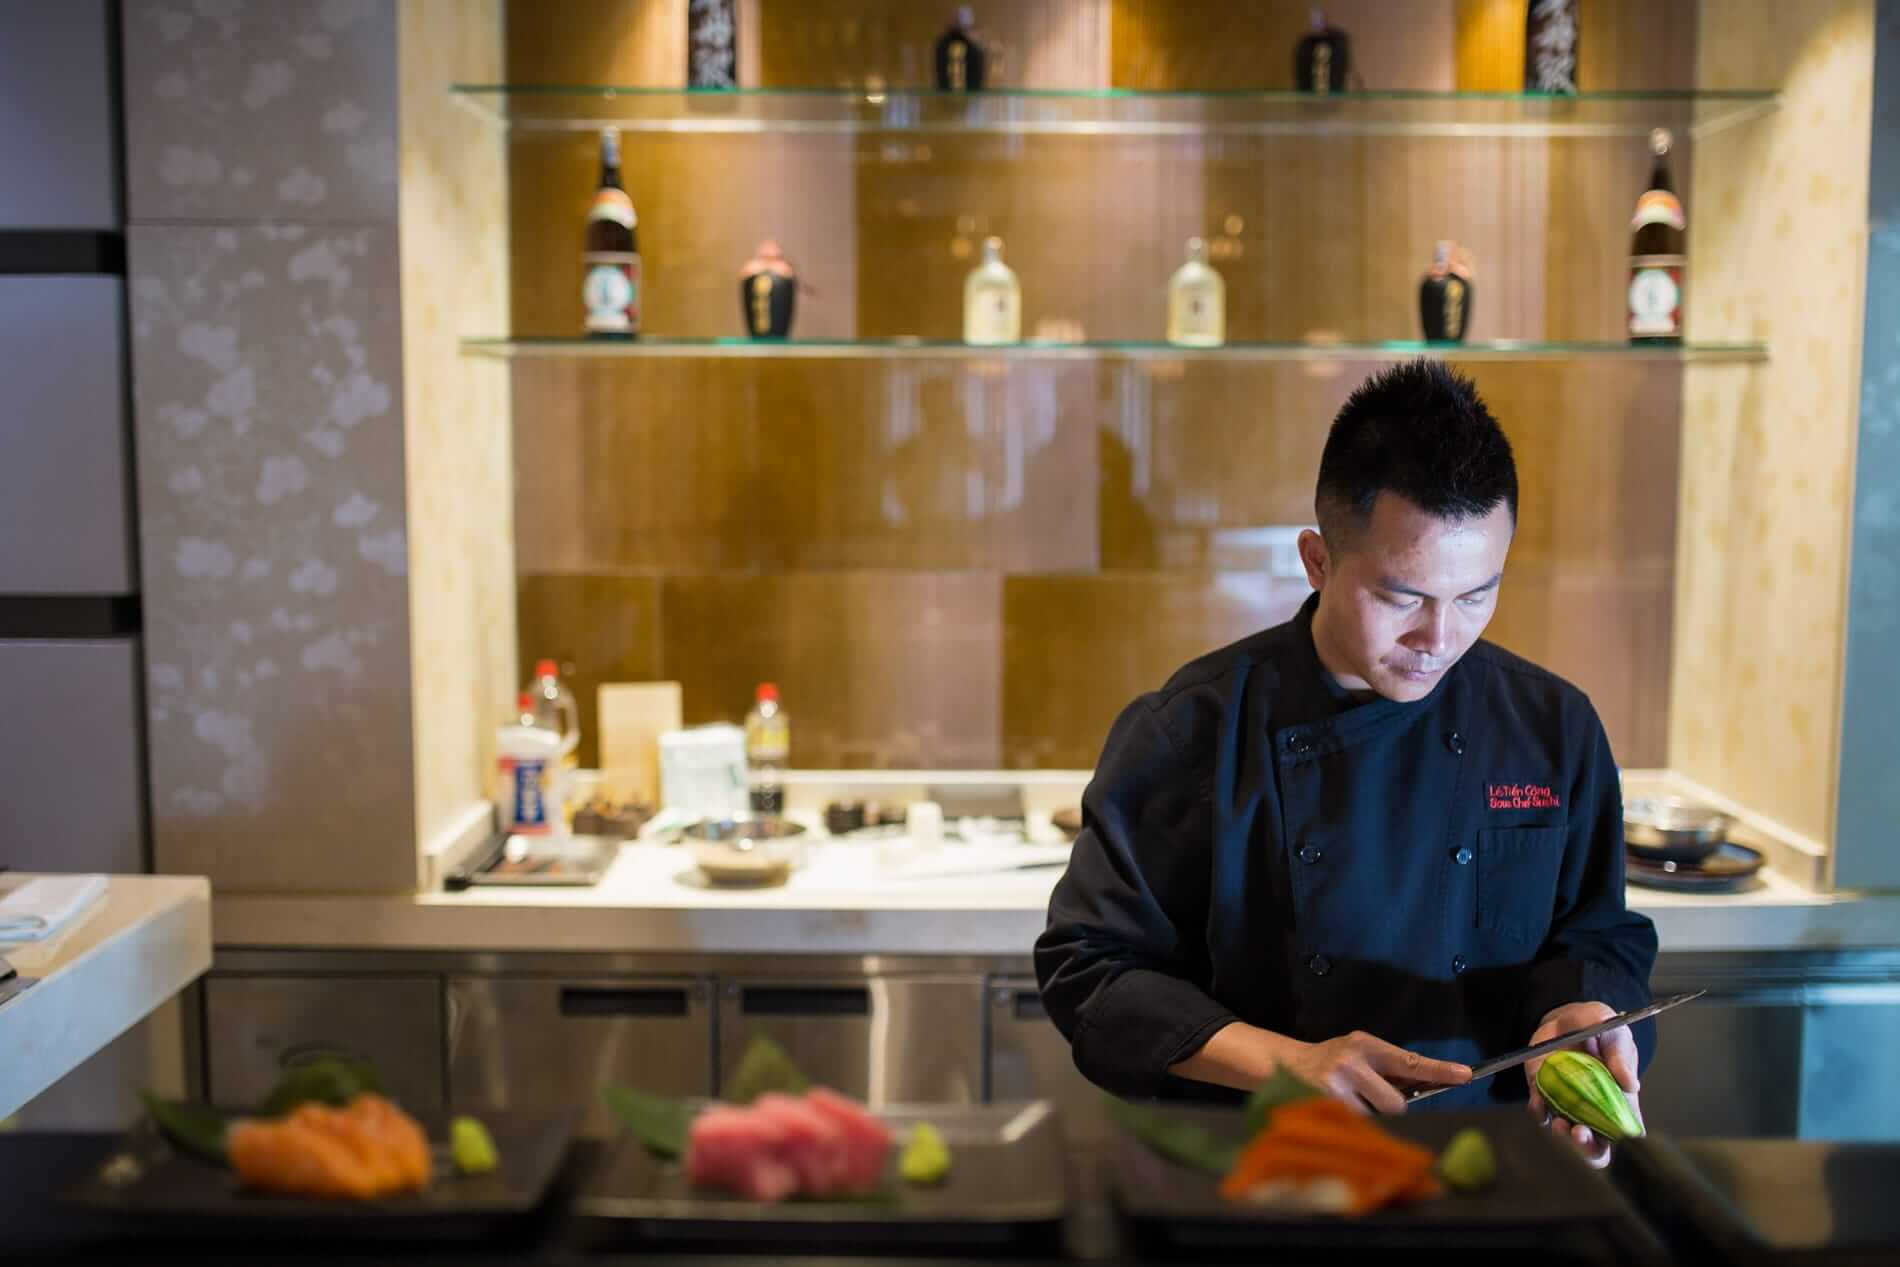 A chef at Wakaku restaurant prepares a meal